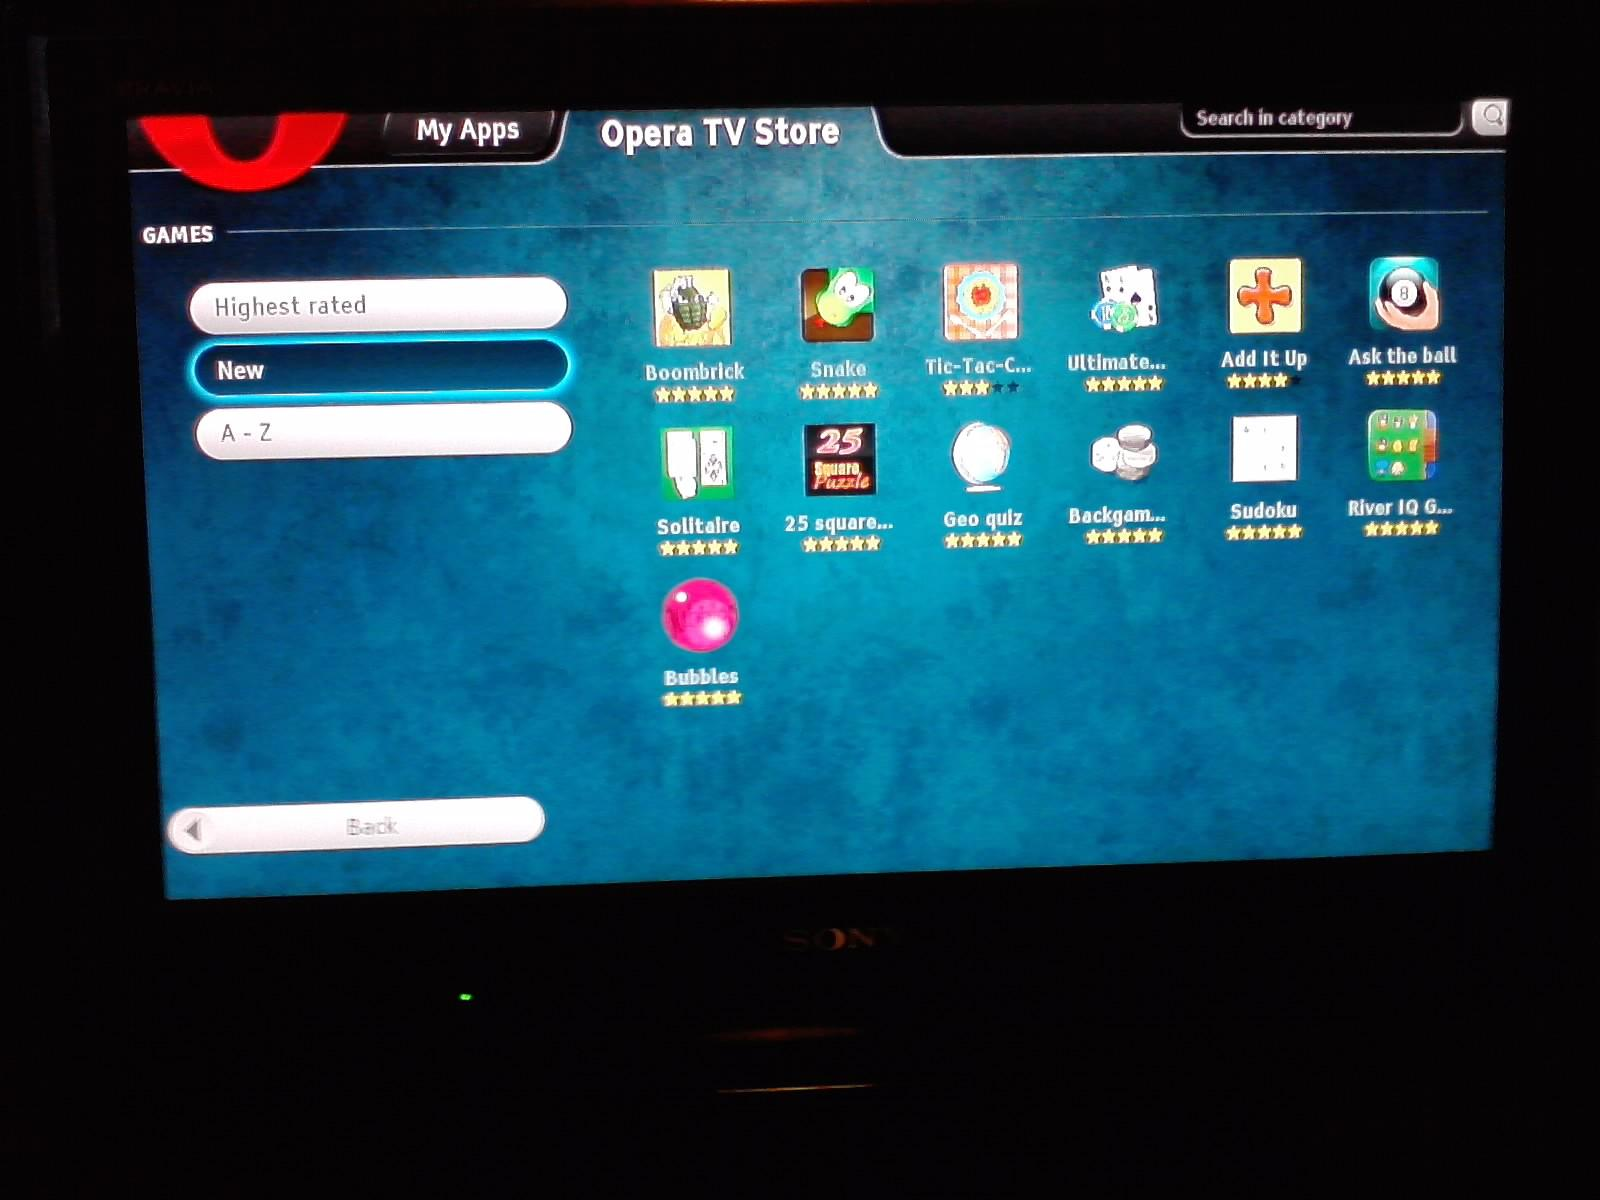 BRAVIA Internet Video : Smart TV from Sony: Opera TV Store